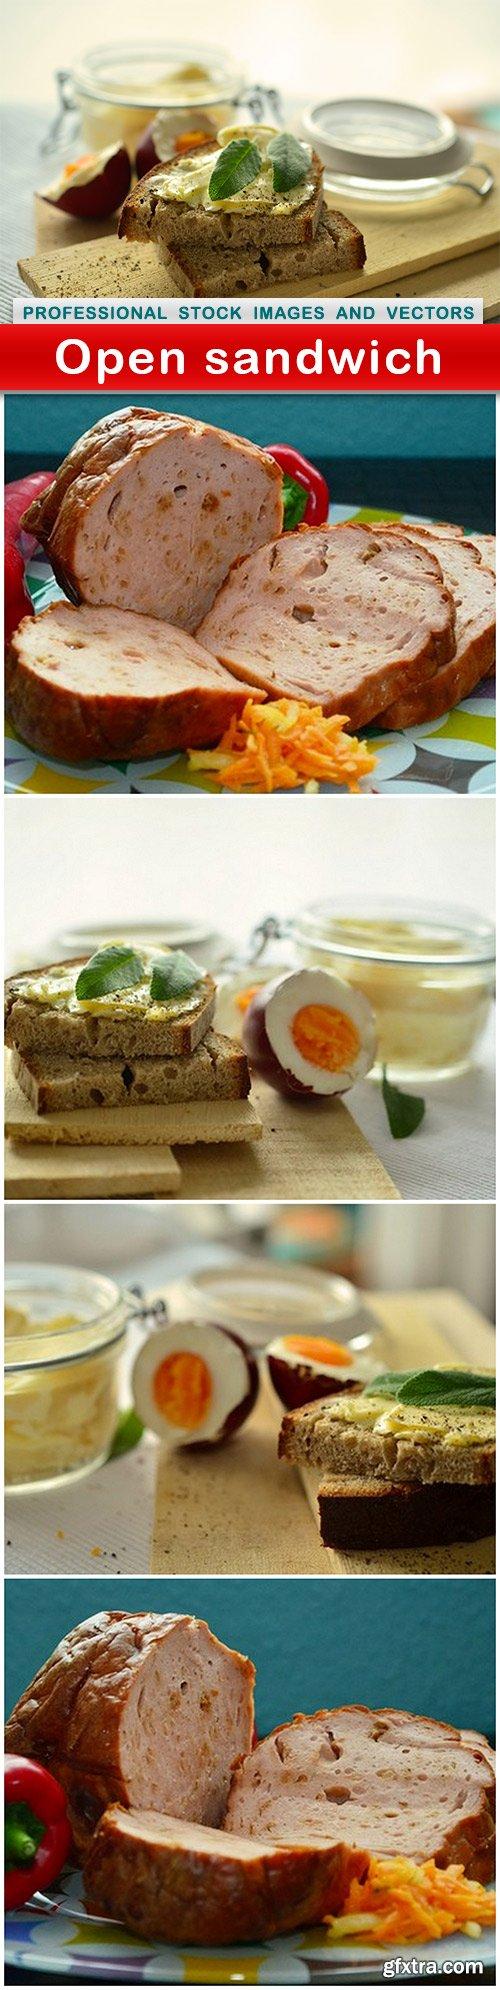 Open sandwich - 5 UHQ JPEG